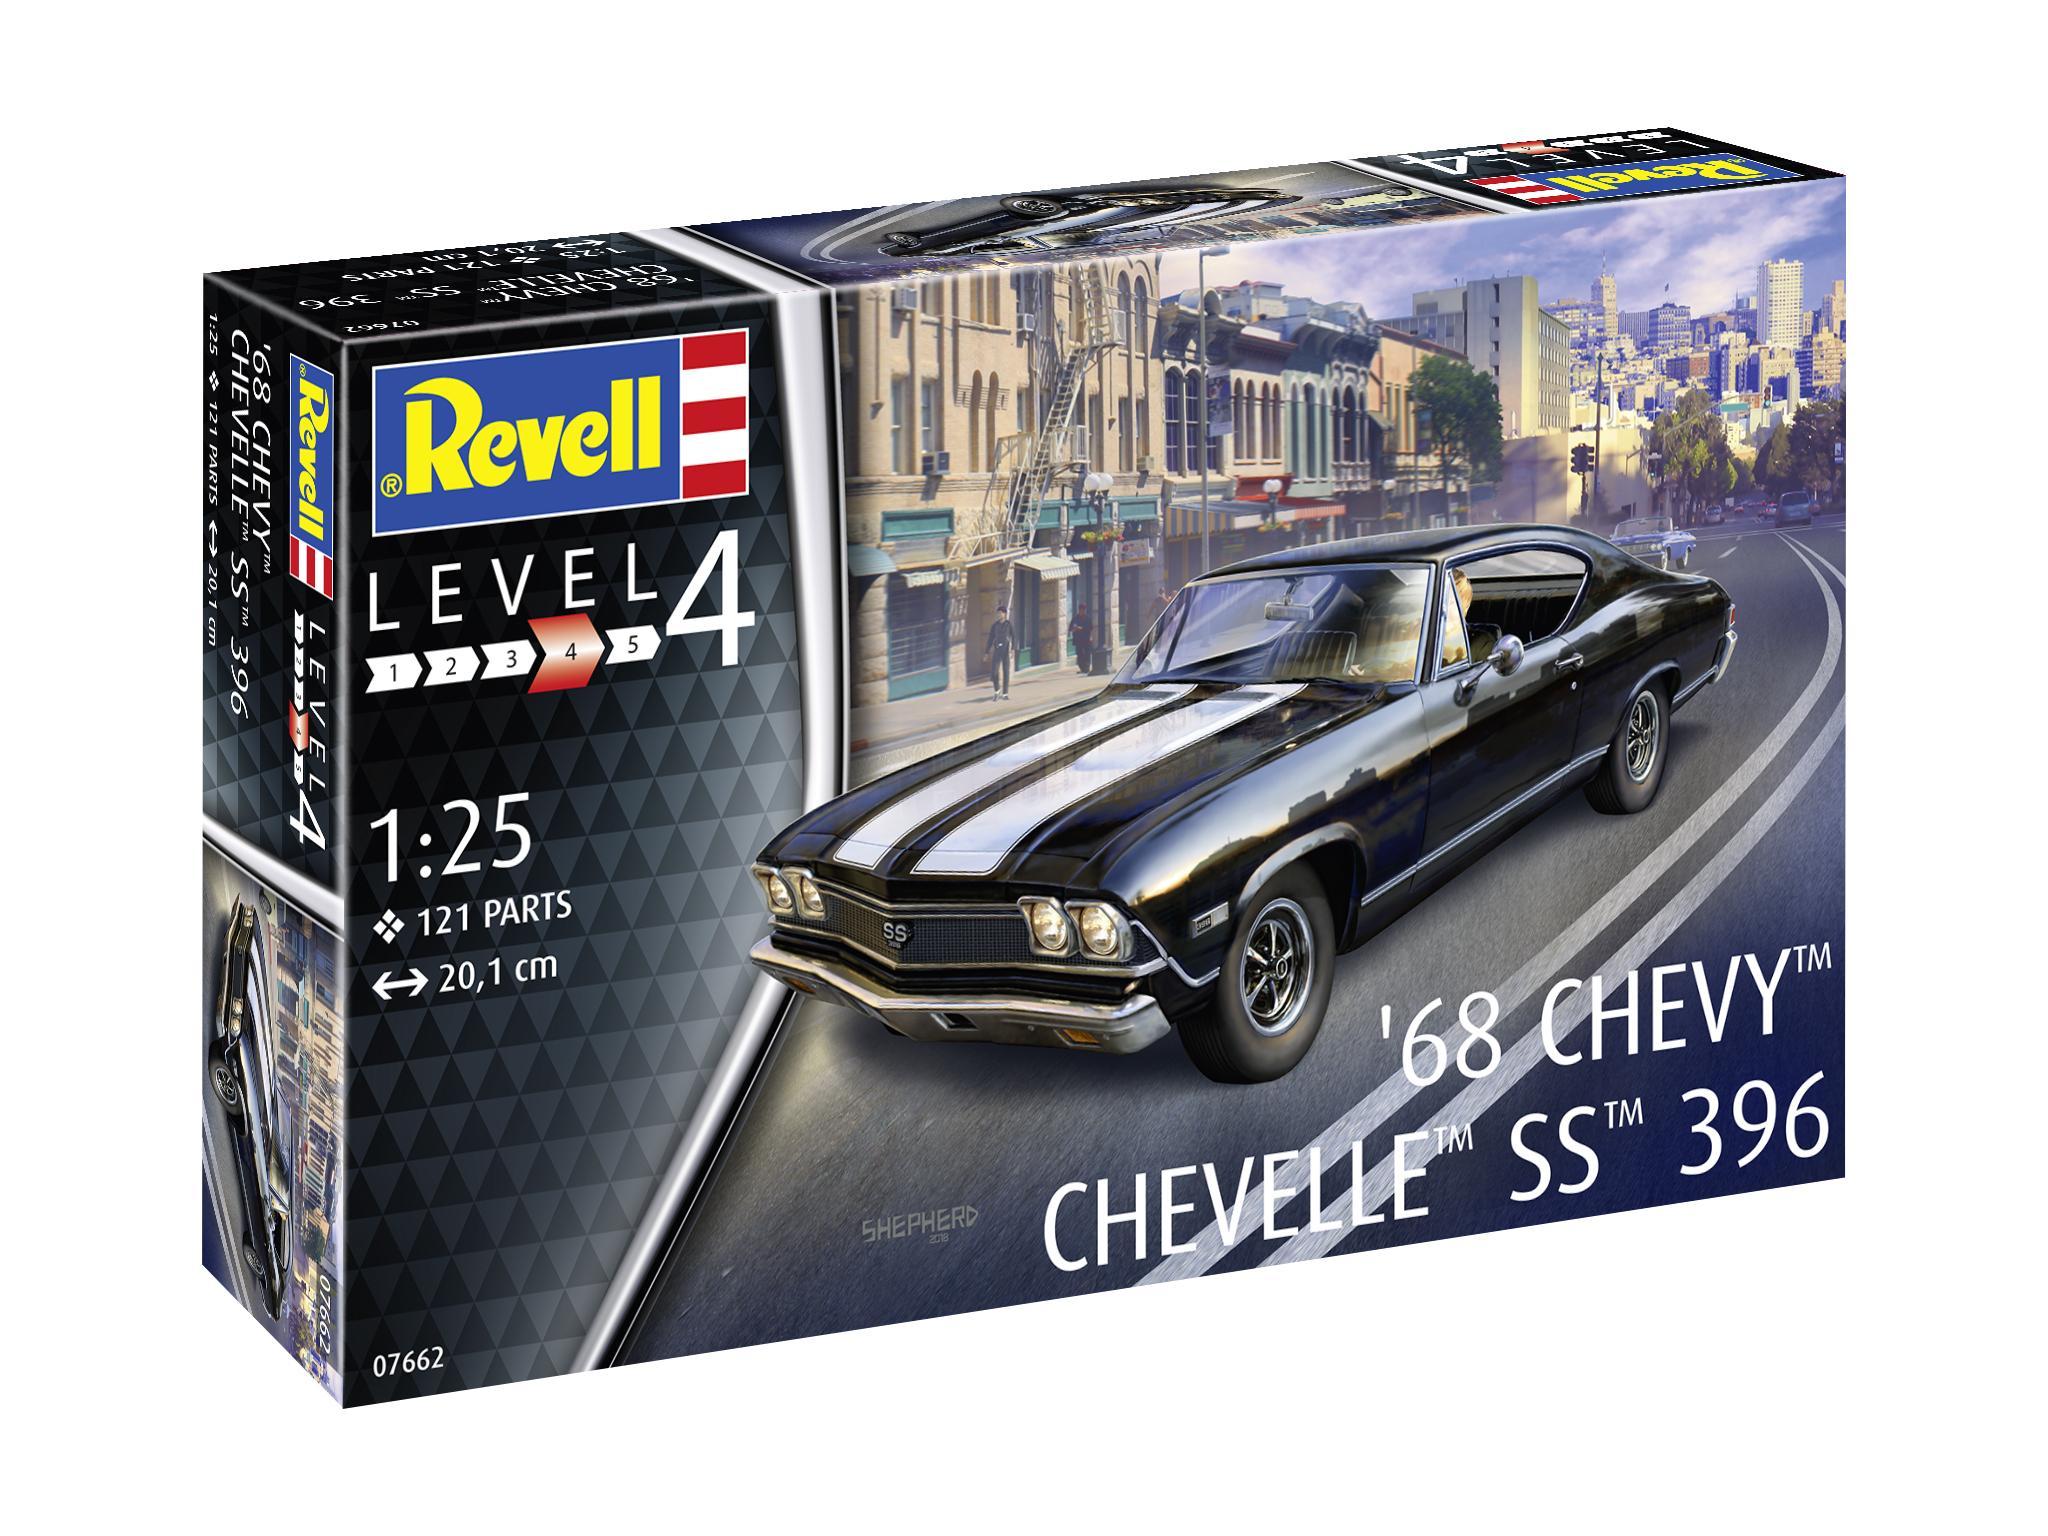 07662_68_chevy_chevelle_ss_396_07.jpg